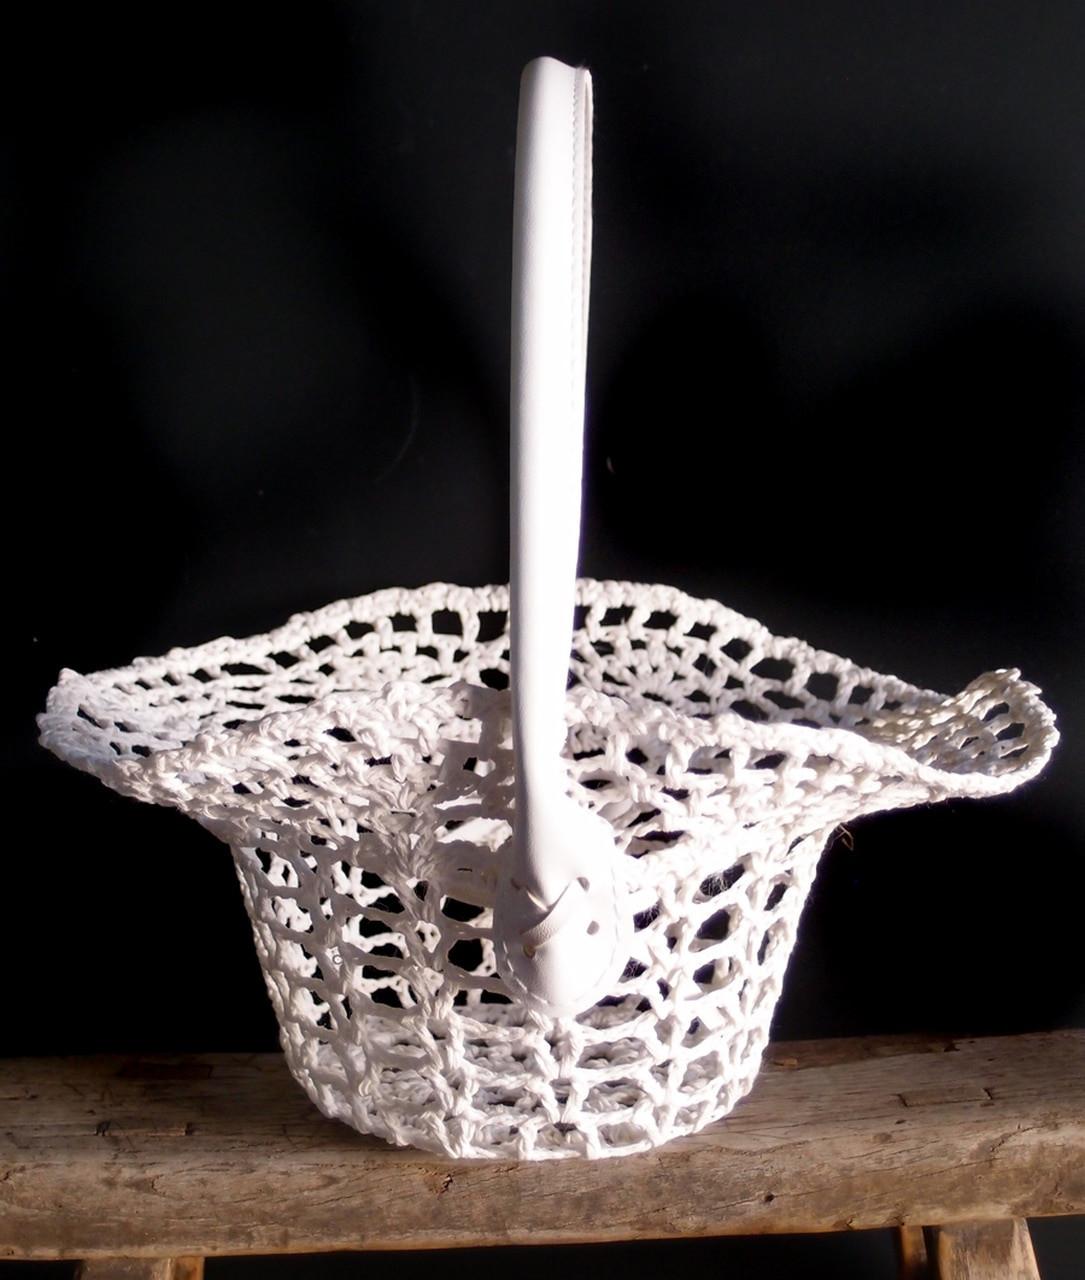 Wholesale Flower Girl Basket, Wholesale Gift Baskets, Wholesale Lace Baskets